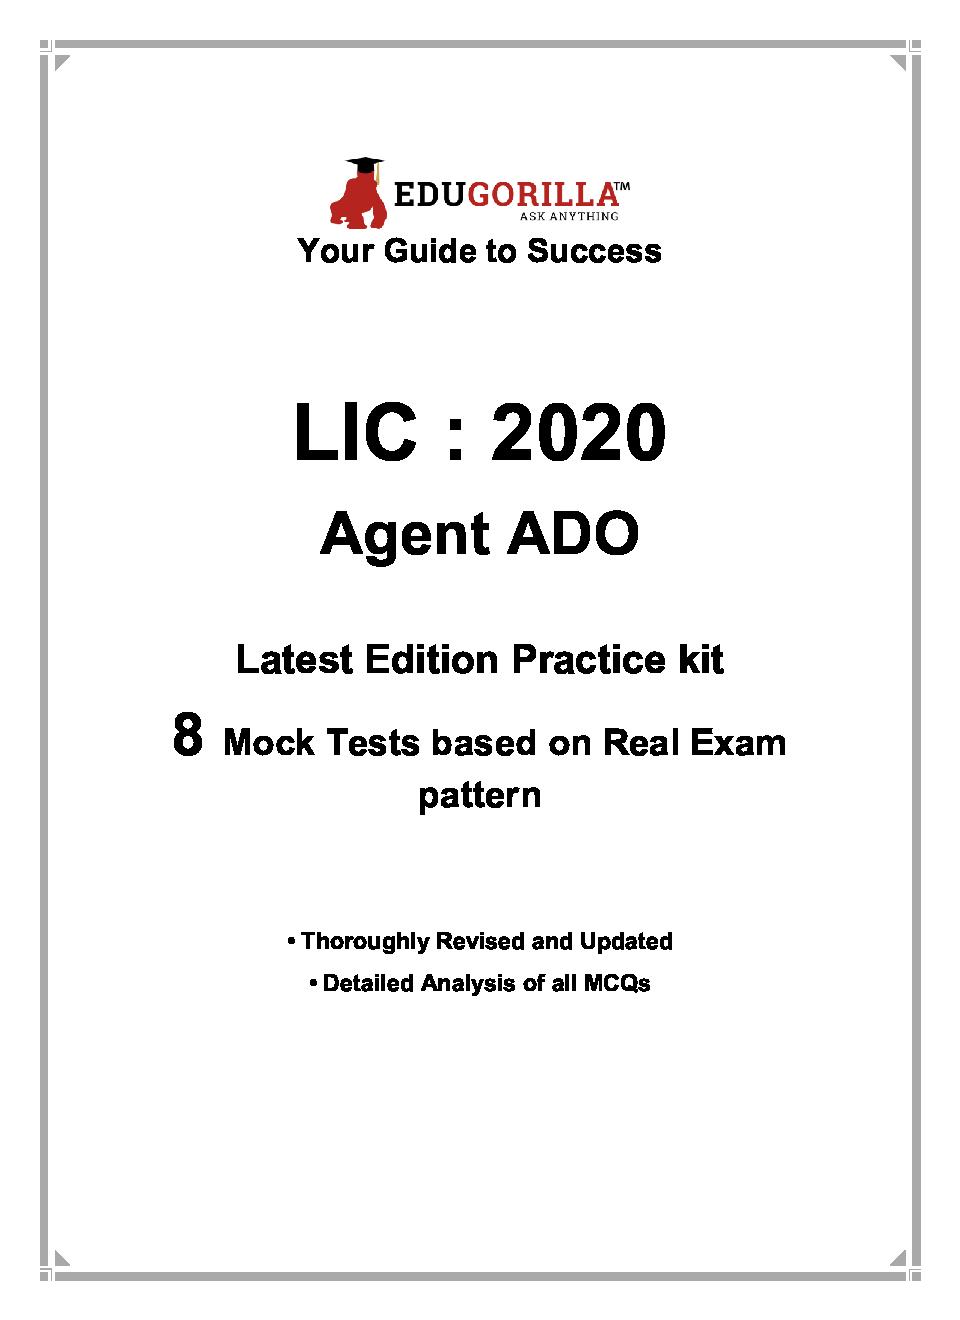 EduGorilla LIC Agent ADO 2020 - 8 Mock Tests -  Latest Edition Practice Kit - Page 3